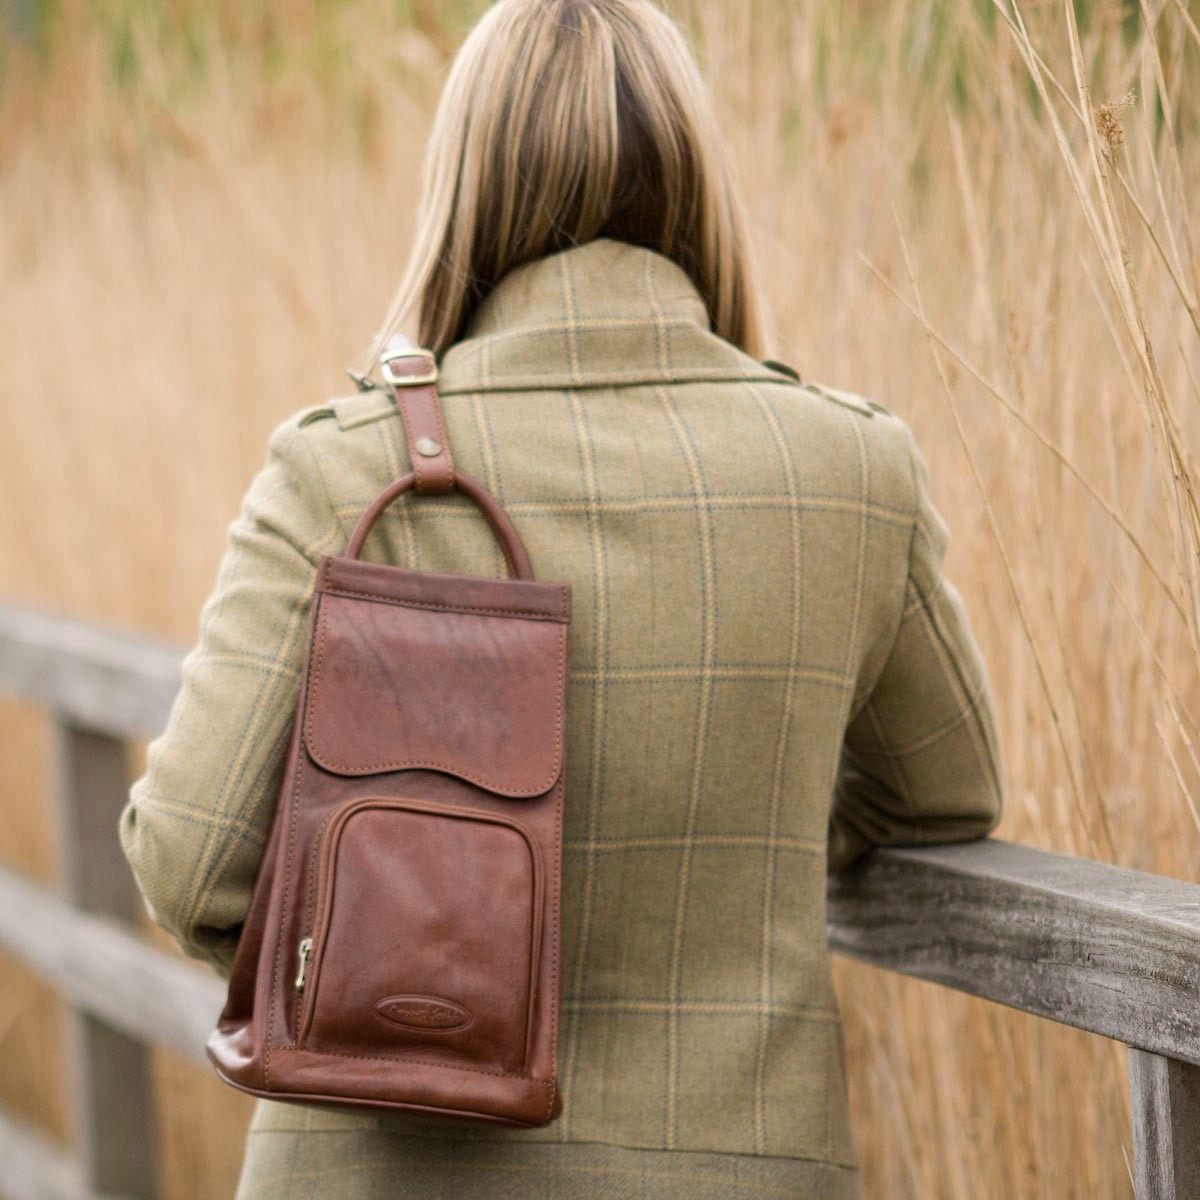 471da5232d12 The Carli Italian Leather Backpack Handbag